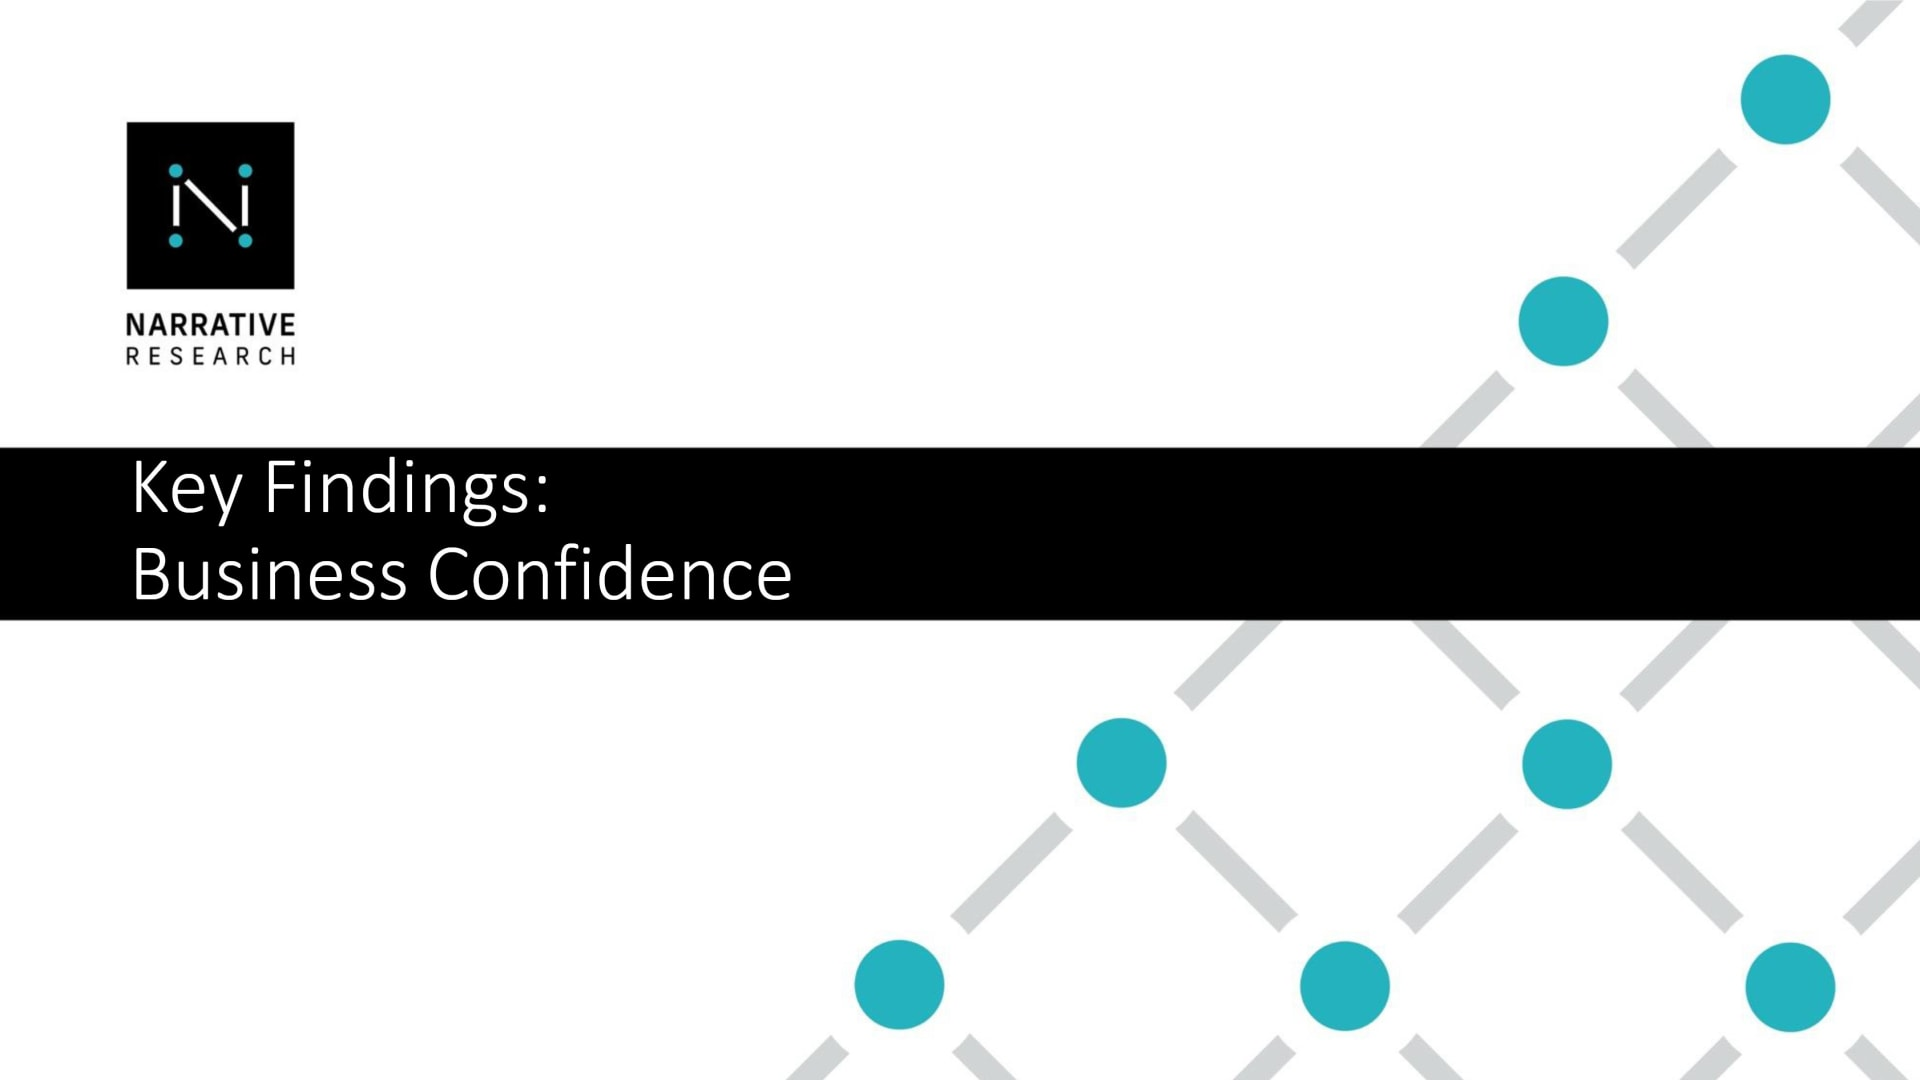 businessconfidence-w1920.jpg